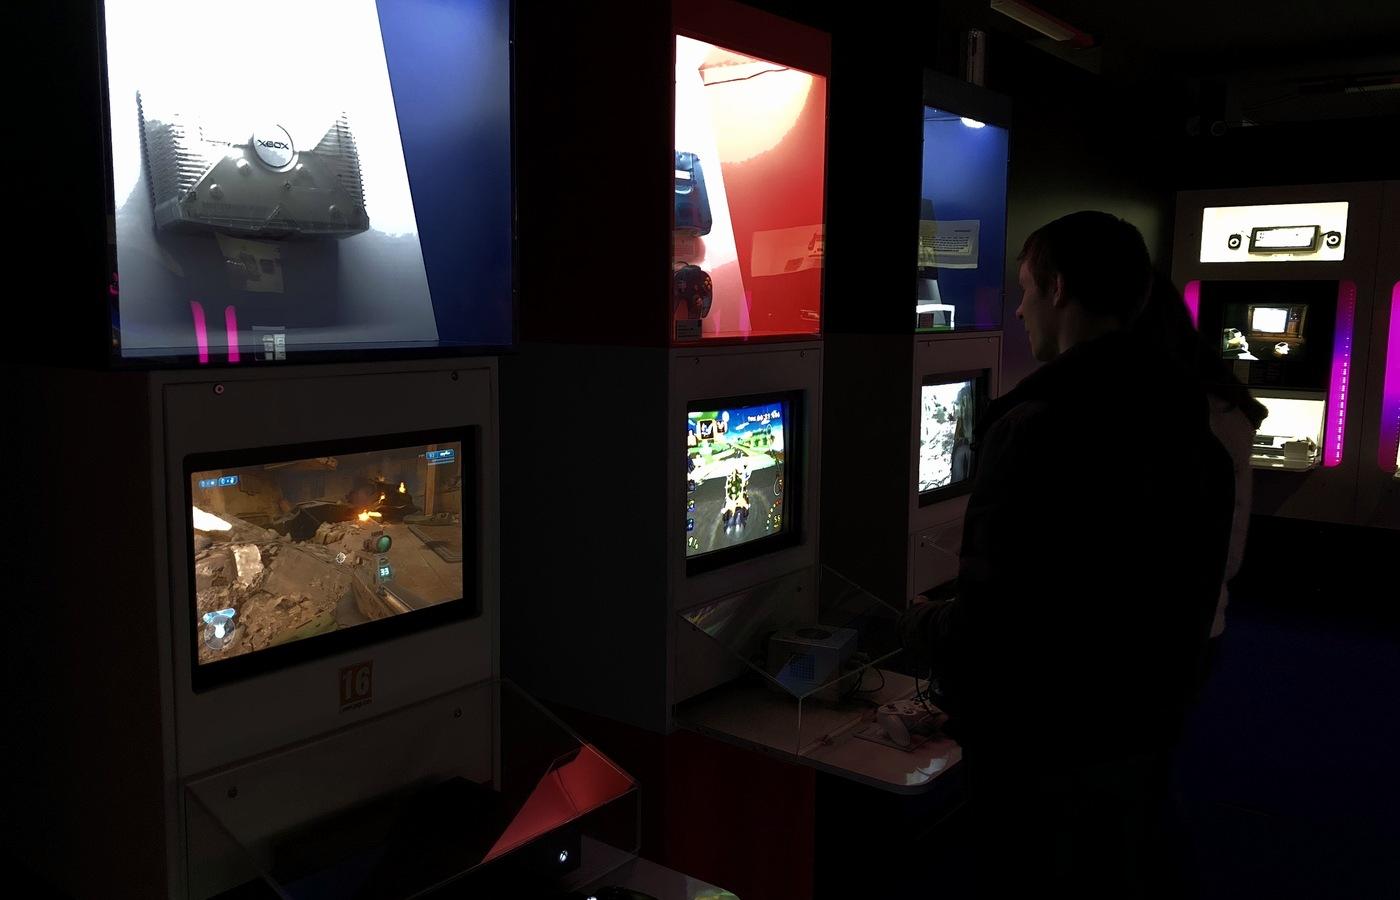 Konzole Microsoft Xbox a Nintento GameCube